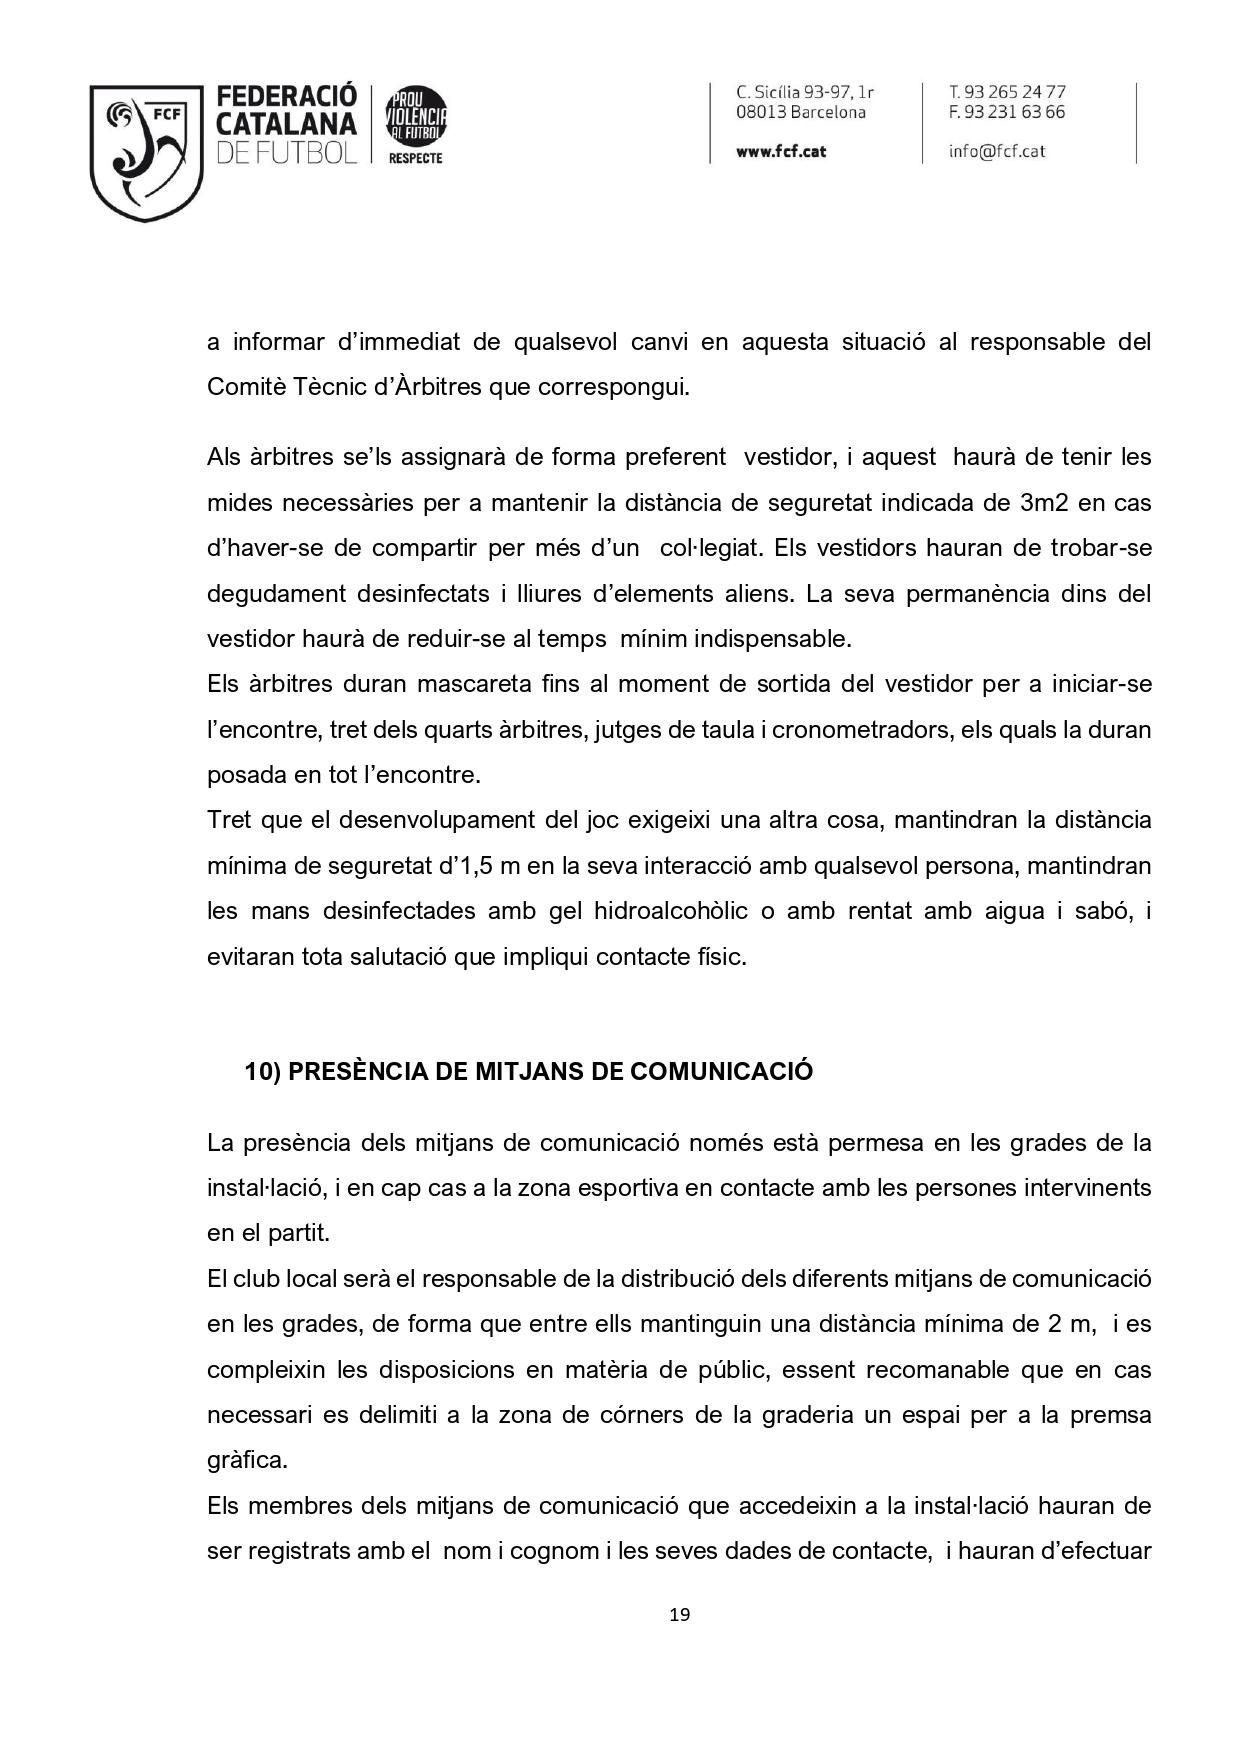 Circular Actualització Protocol Competicions _set21_2_page-0019